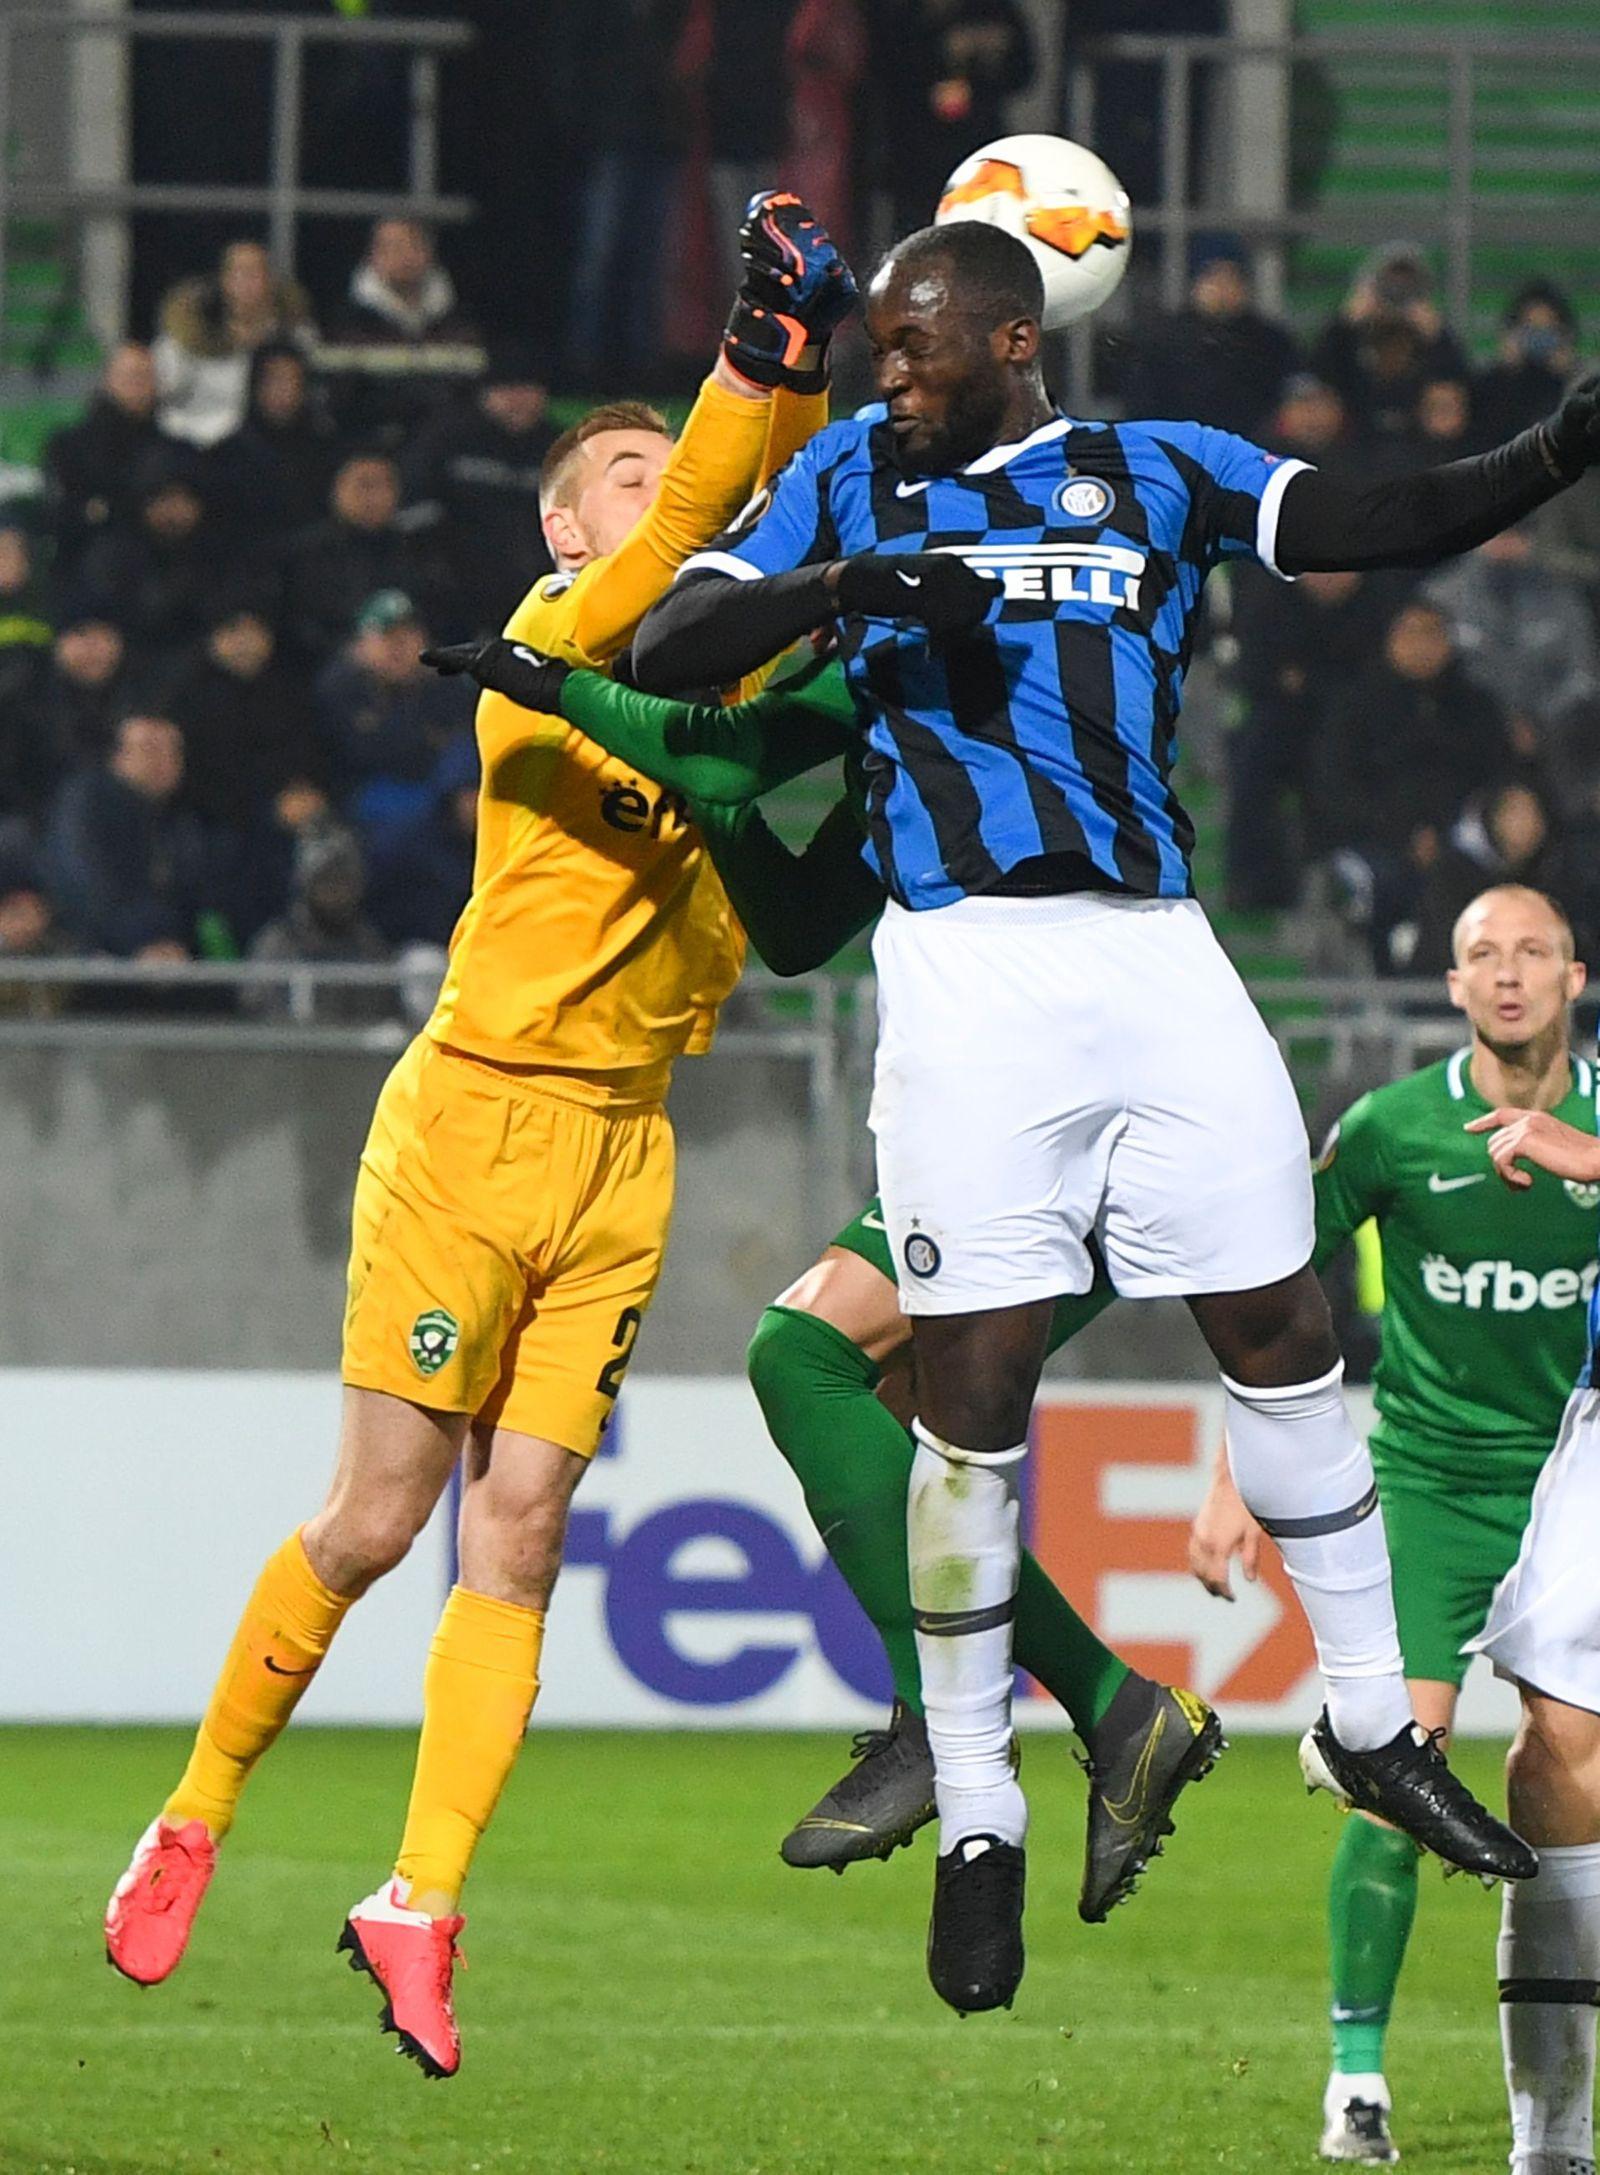 PFC Ludogorets Razgrad vs Inter Milan, Bulgaria - 20 Feb 2020